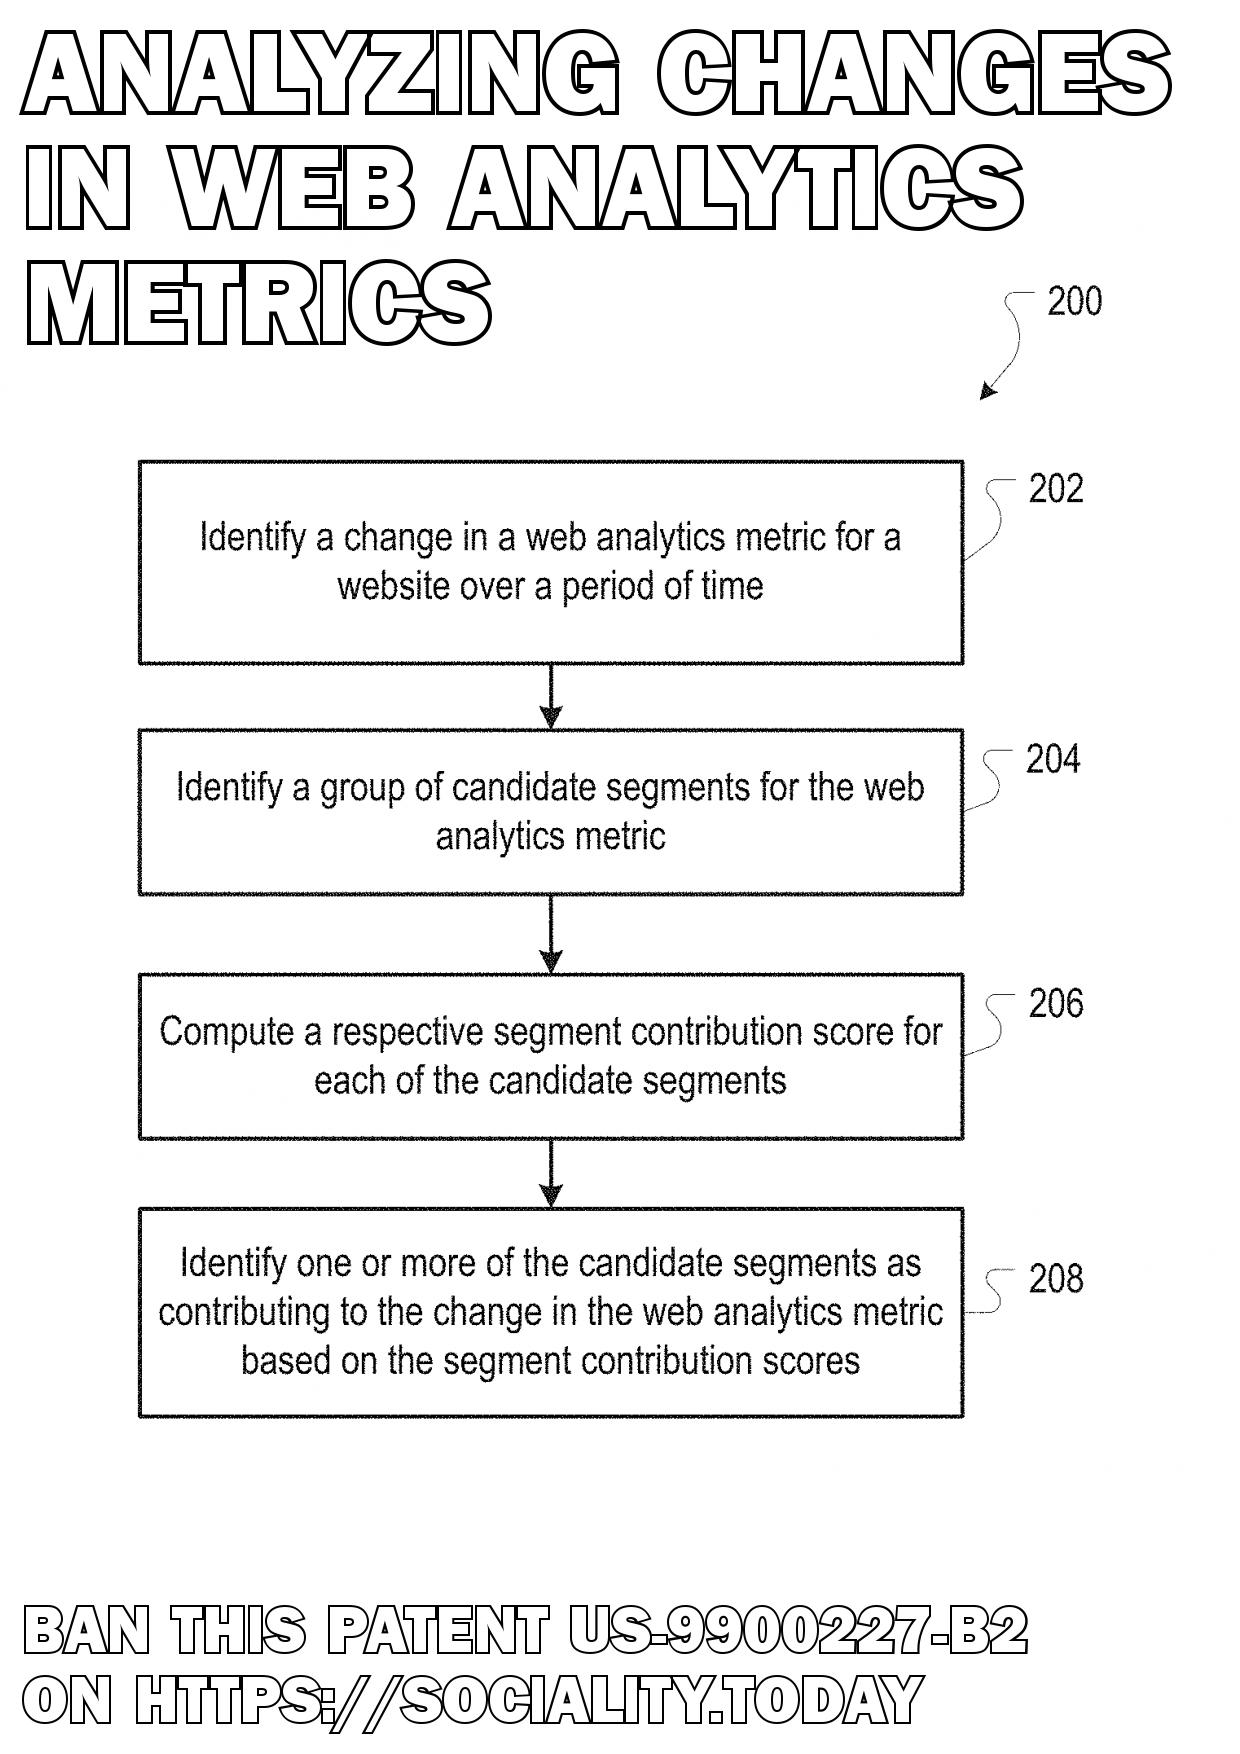 Analyzing changes in web analytics metrics  - US-9900227-B2